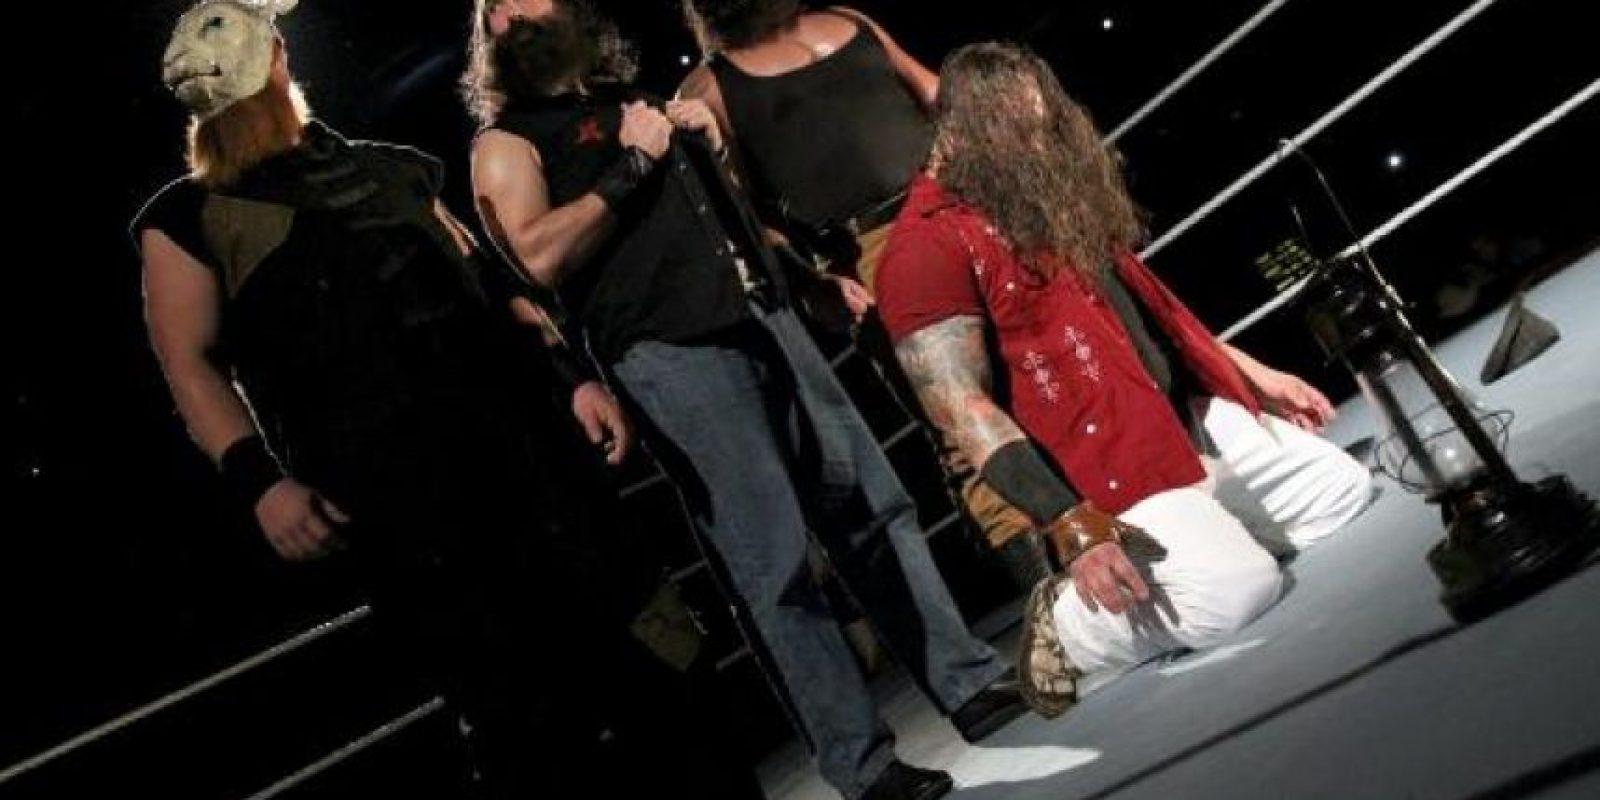 Detrás de Bray se encuentran los temibles Eric Rowan, Luke Harper y Braun Strowman Foto:WWE